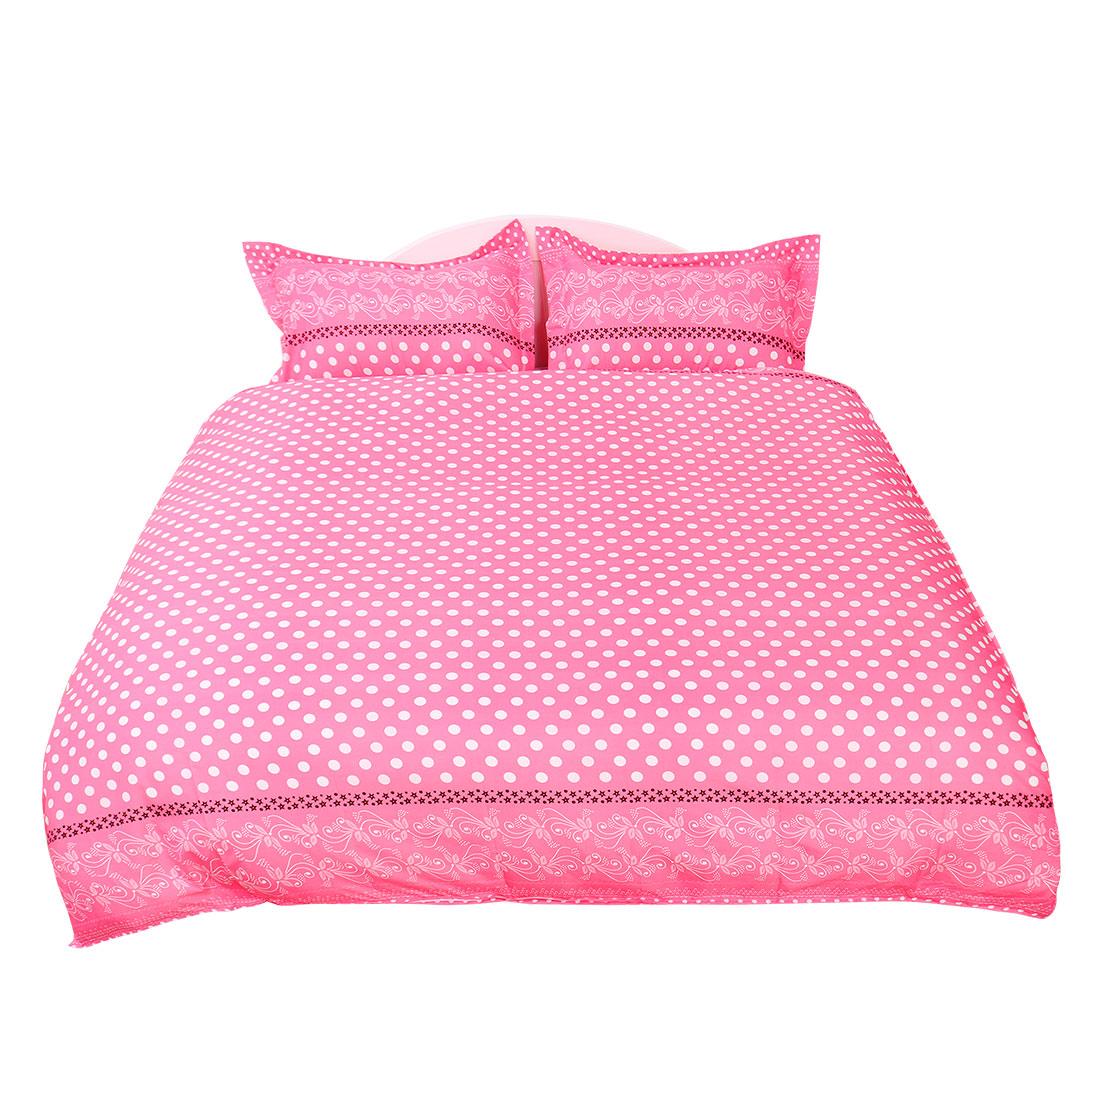 Dots Pattern Duvet Cover Pillowcase Quilt Cover Bedding Set Super King